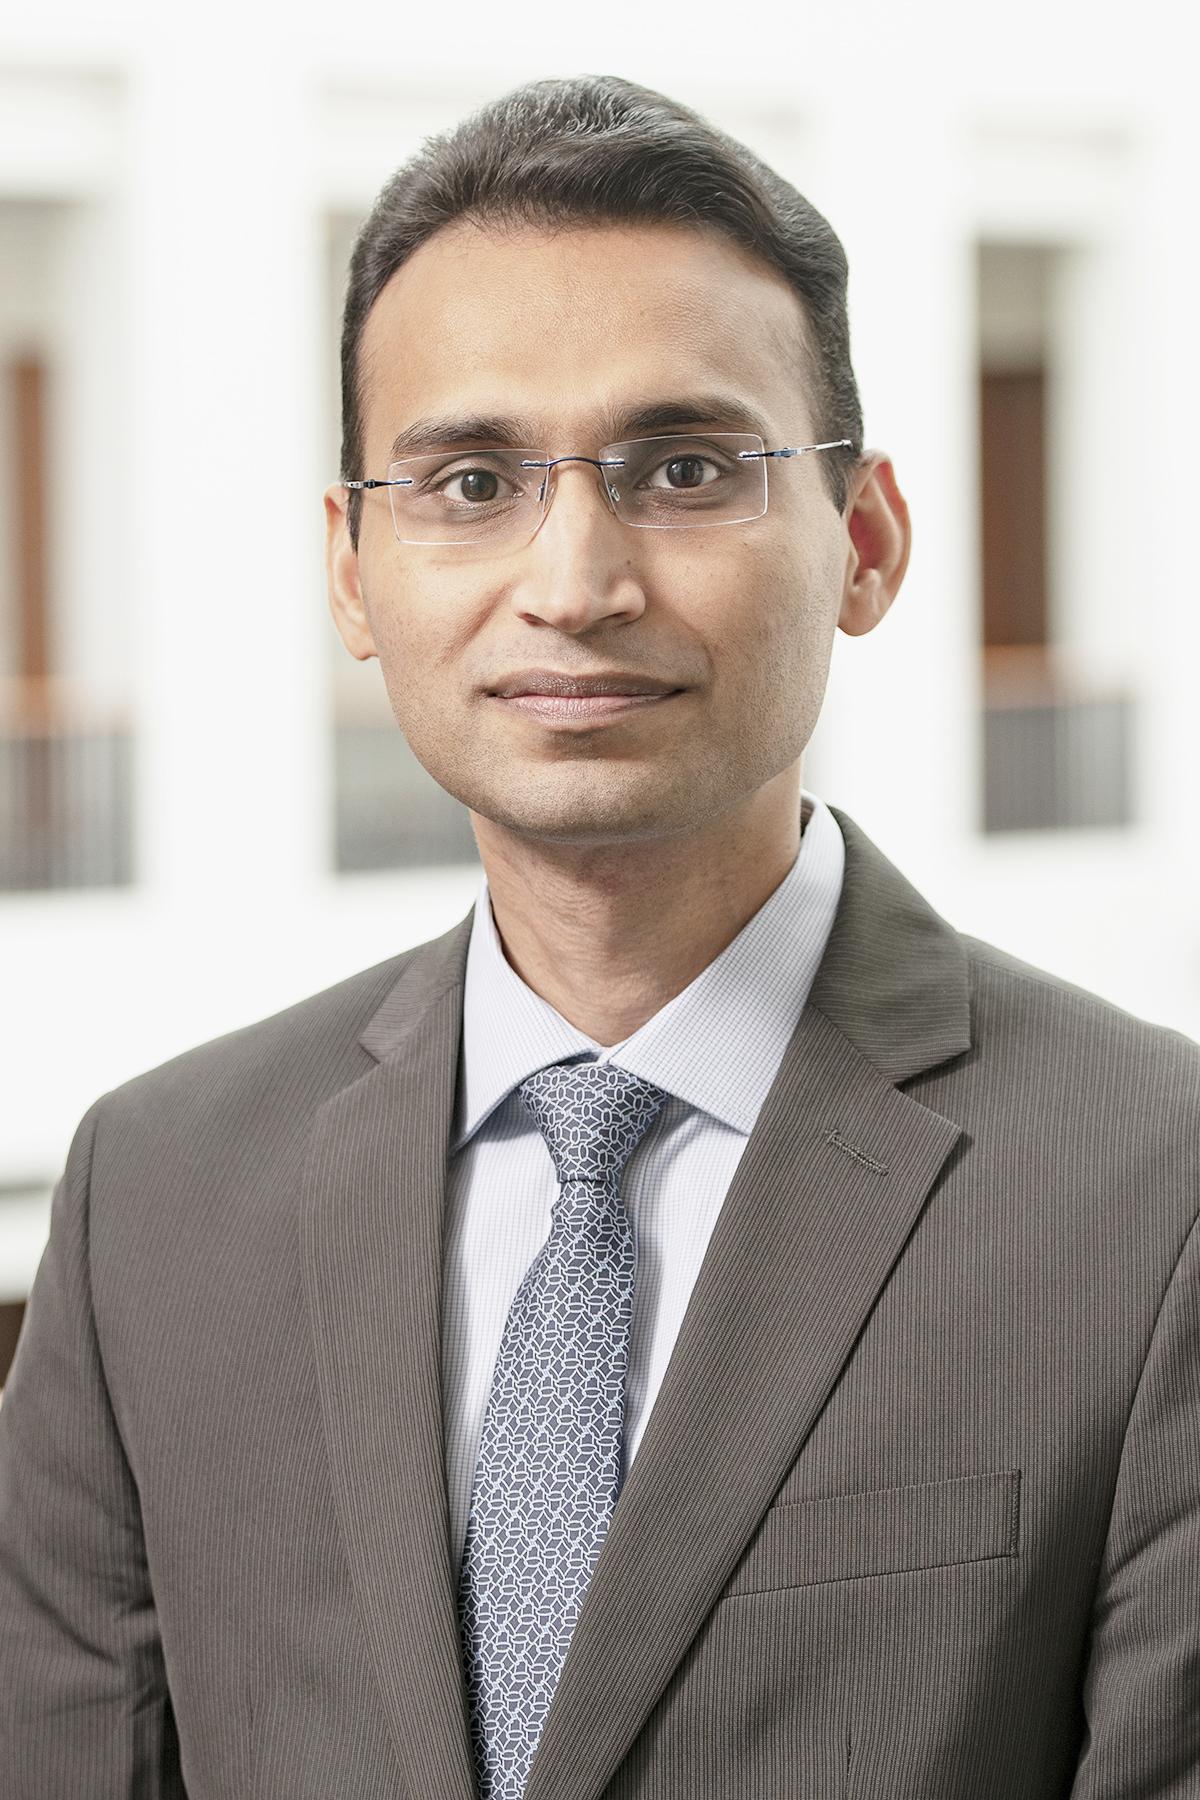 Pawan Jain Ph.D, CFA, CFP